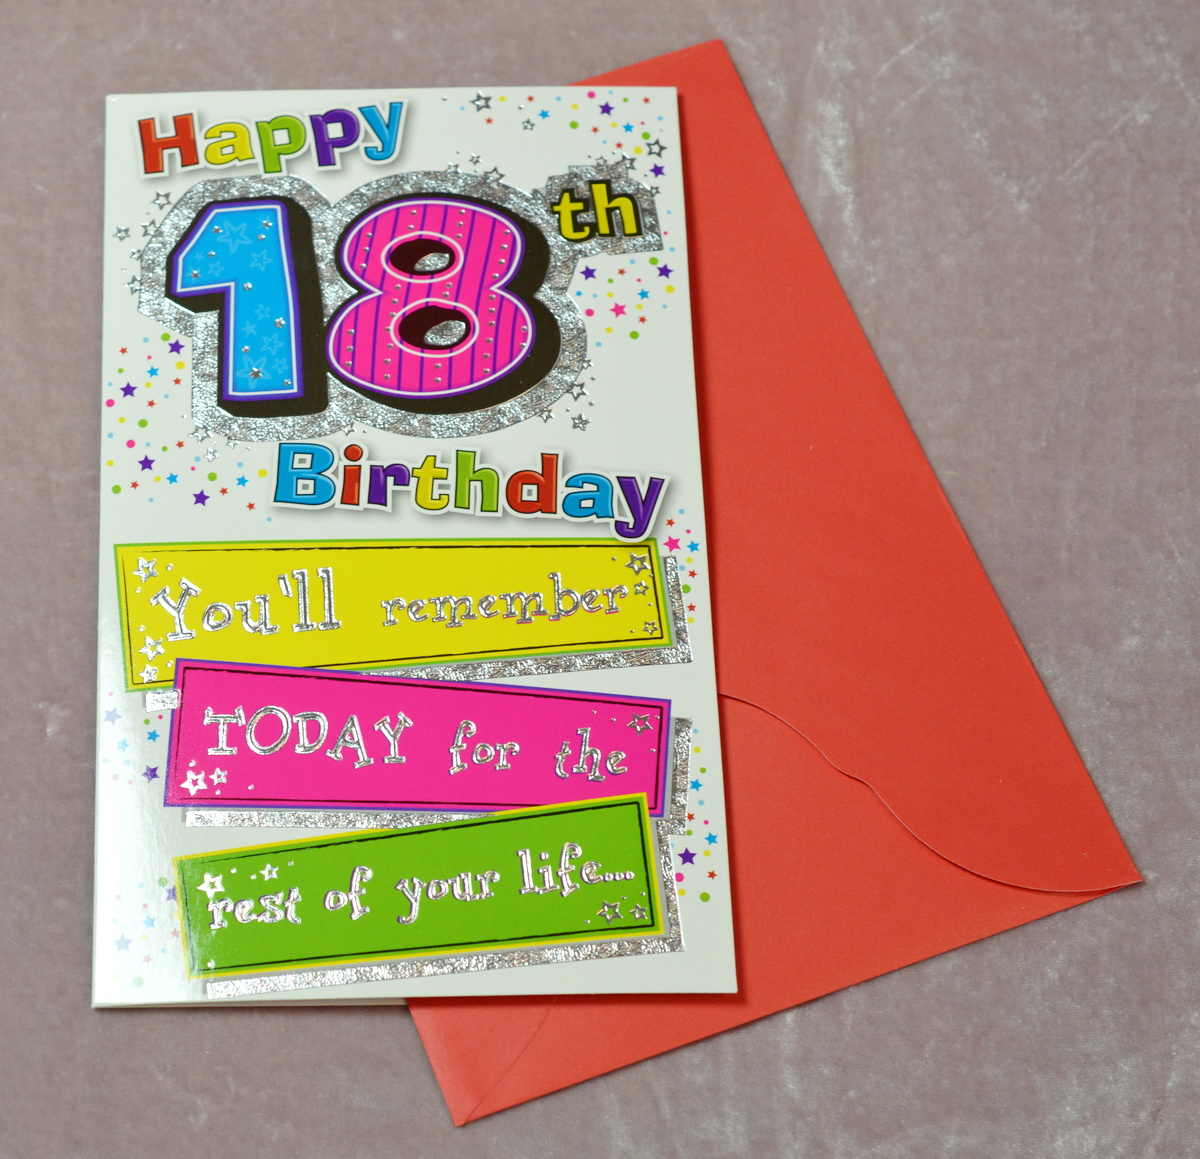 Handmade birthday card ideas for boyfriend handmade cards for love homemade birthday greeting cards for boyfriend infocardco 33371 men 18th birthday homemade birthday greeting cards for bookmarktalkfo Images